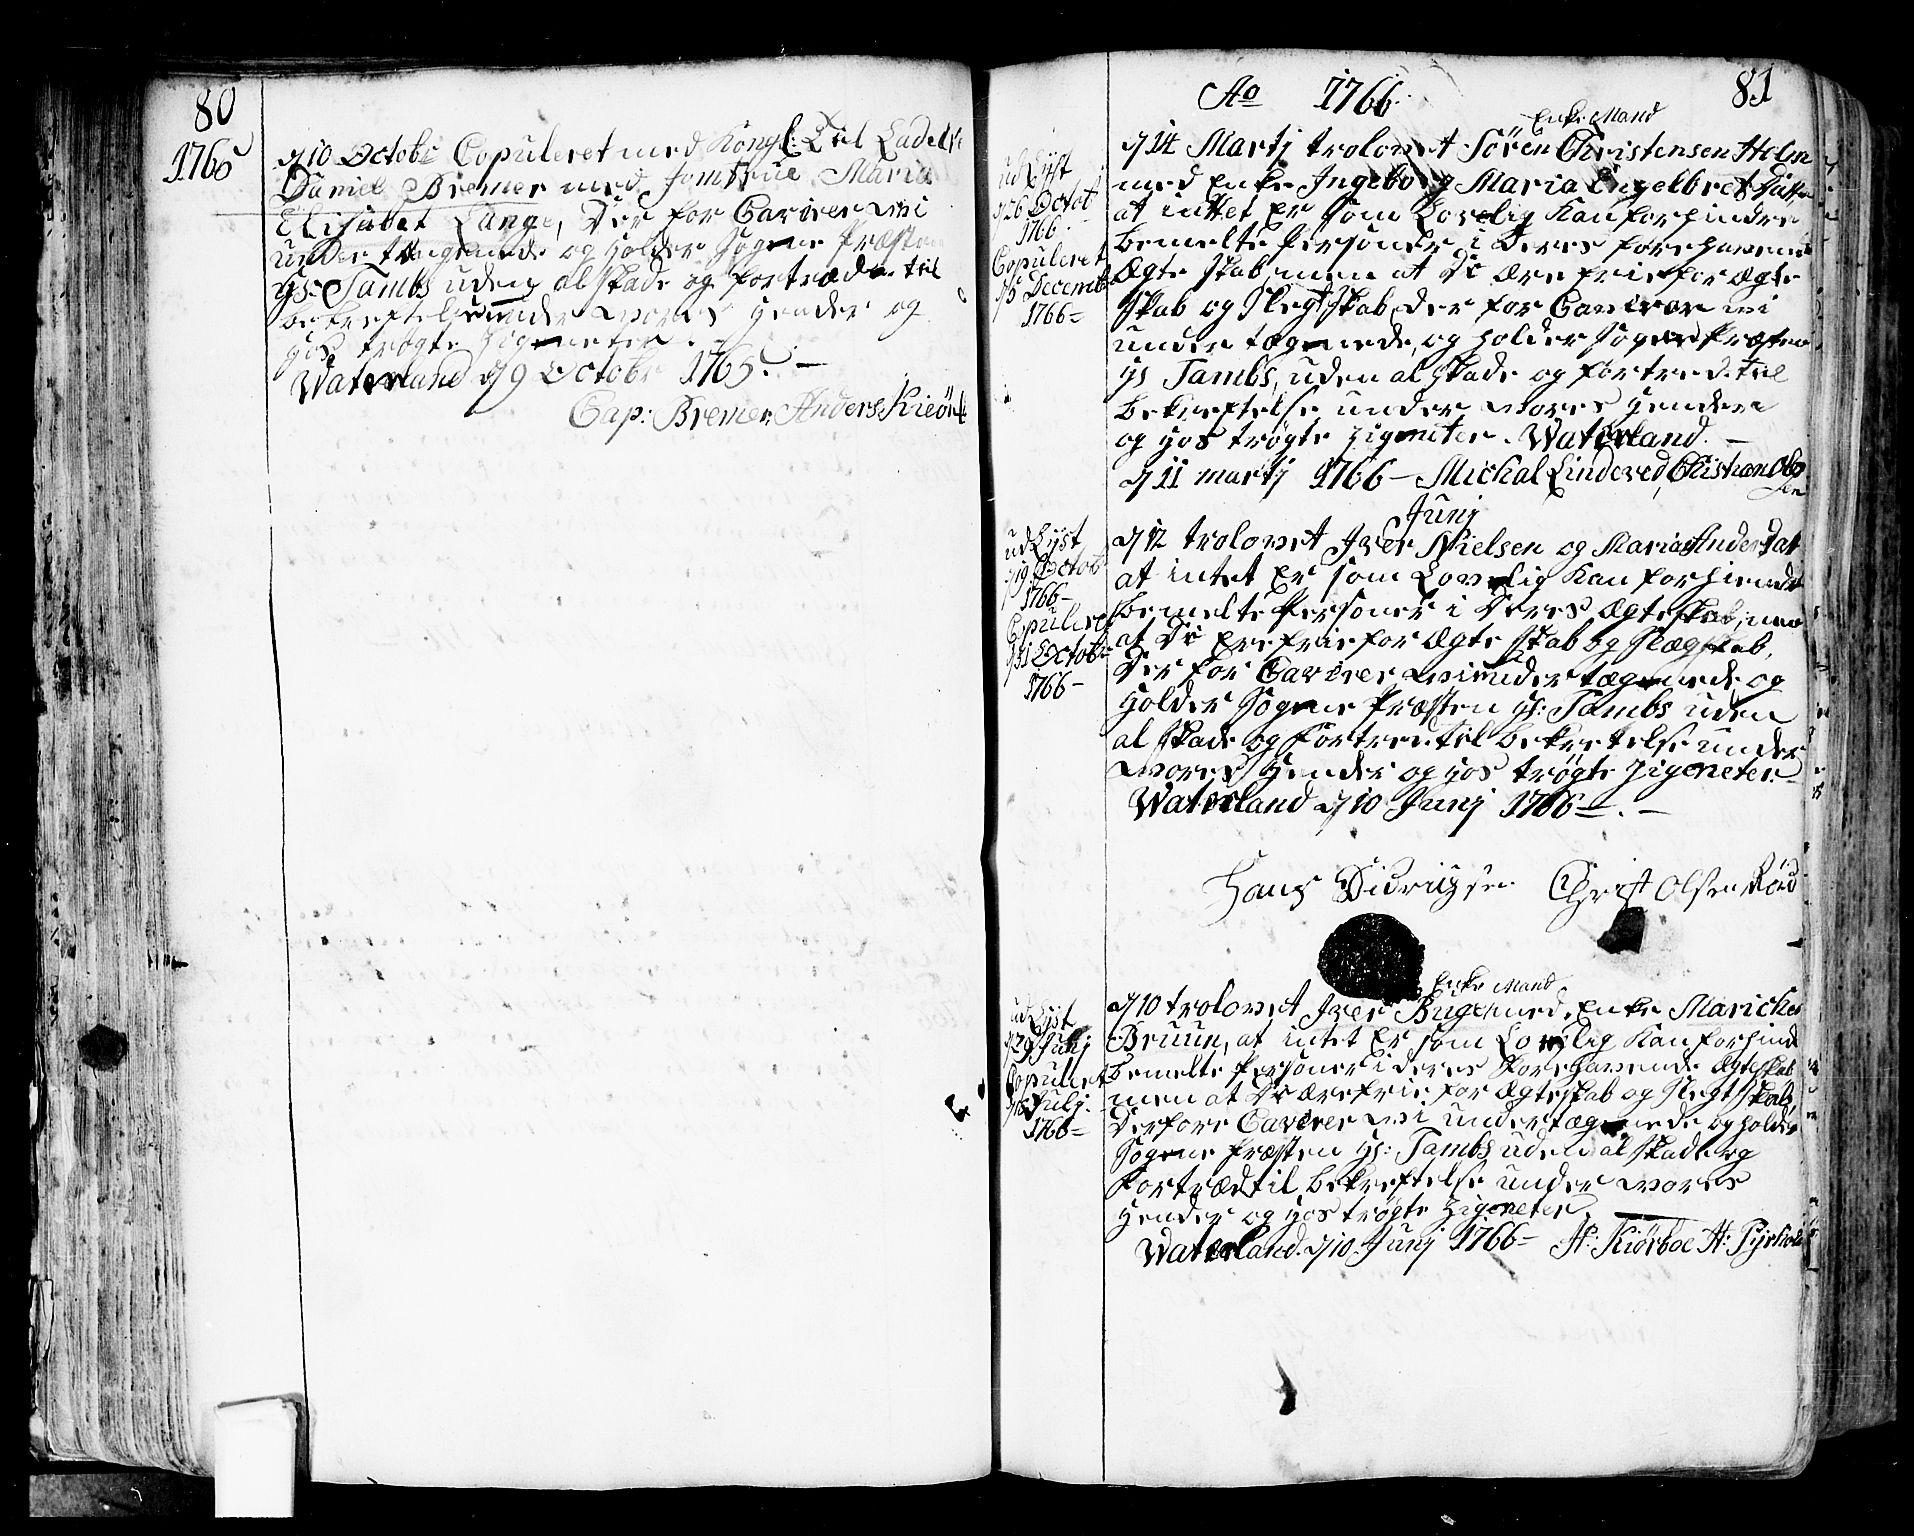 SAO, Fredrikstad prestekontor Kirkebøker, F/Fa/L0002: Ministerialbok nr. 2, 1750-1804, s. 80-81